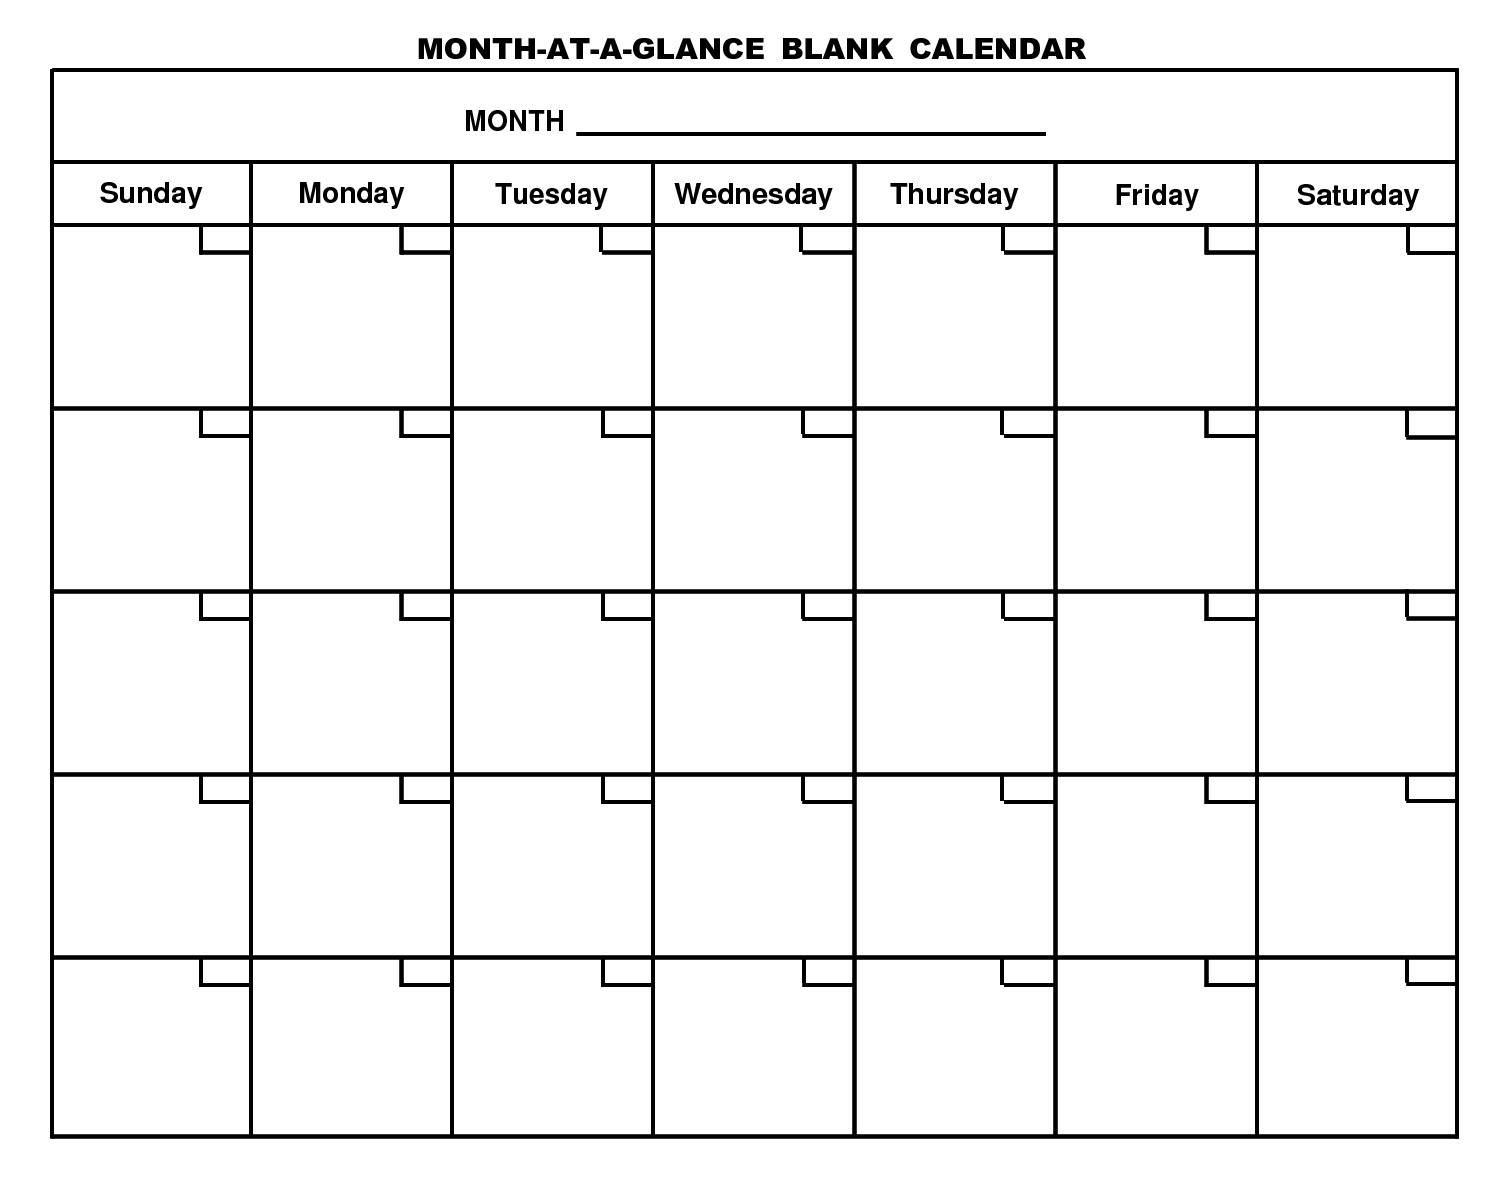 Free Printable Month At A Glance Blank Calendar 150611793abry